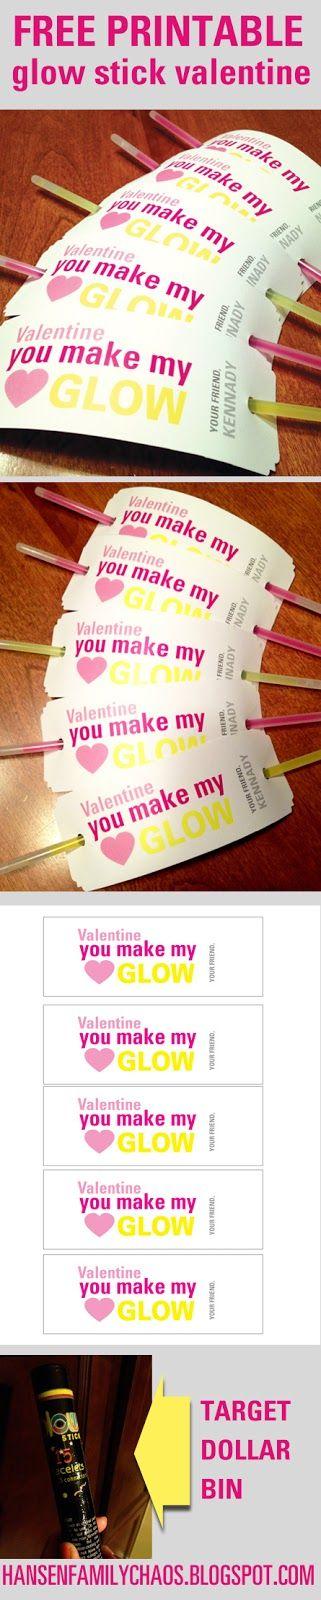 GLOW STICKS>>>Easy peasy kids Valentine's Day treats: FREE PRINTABLES